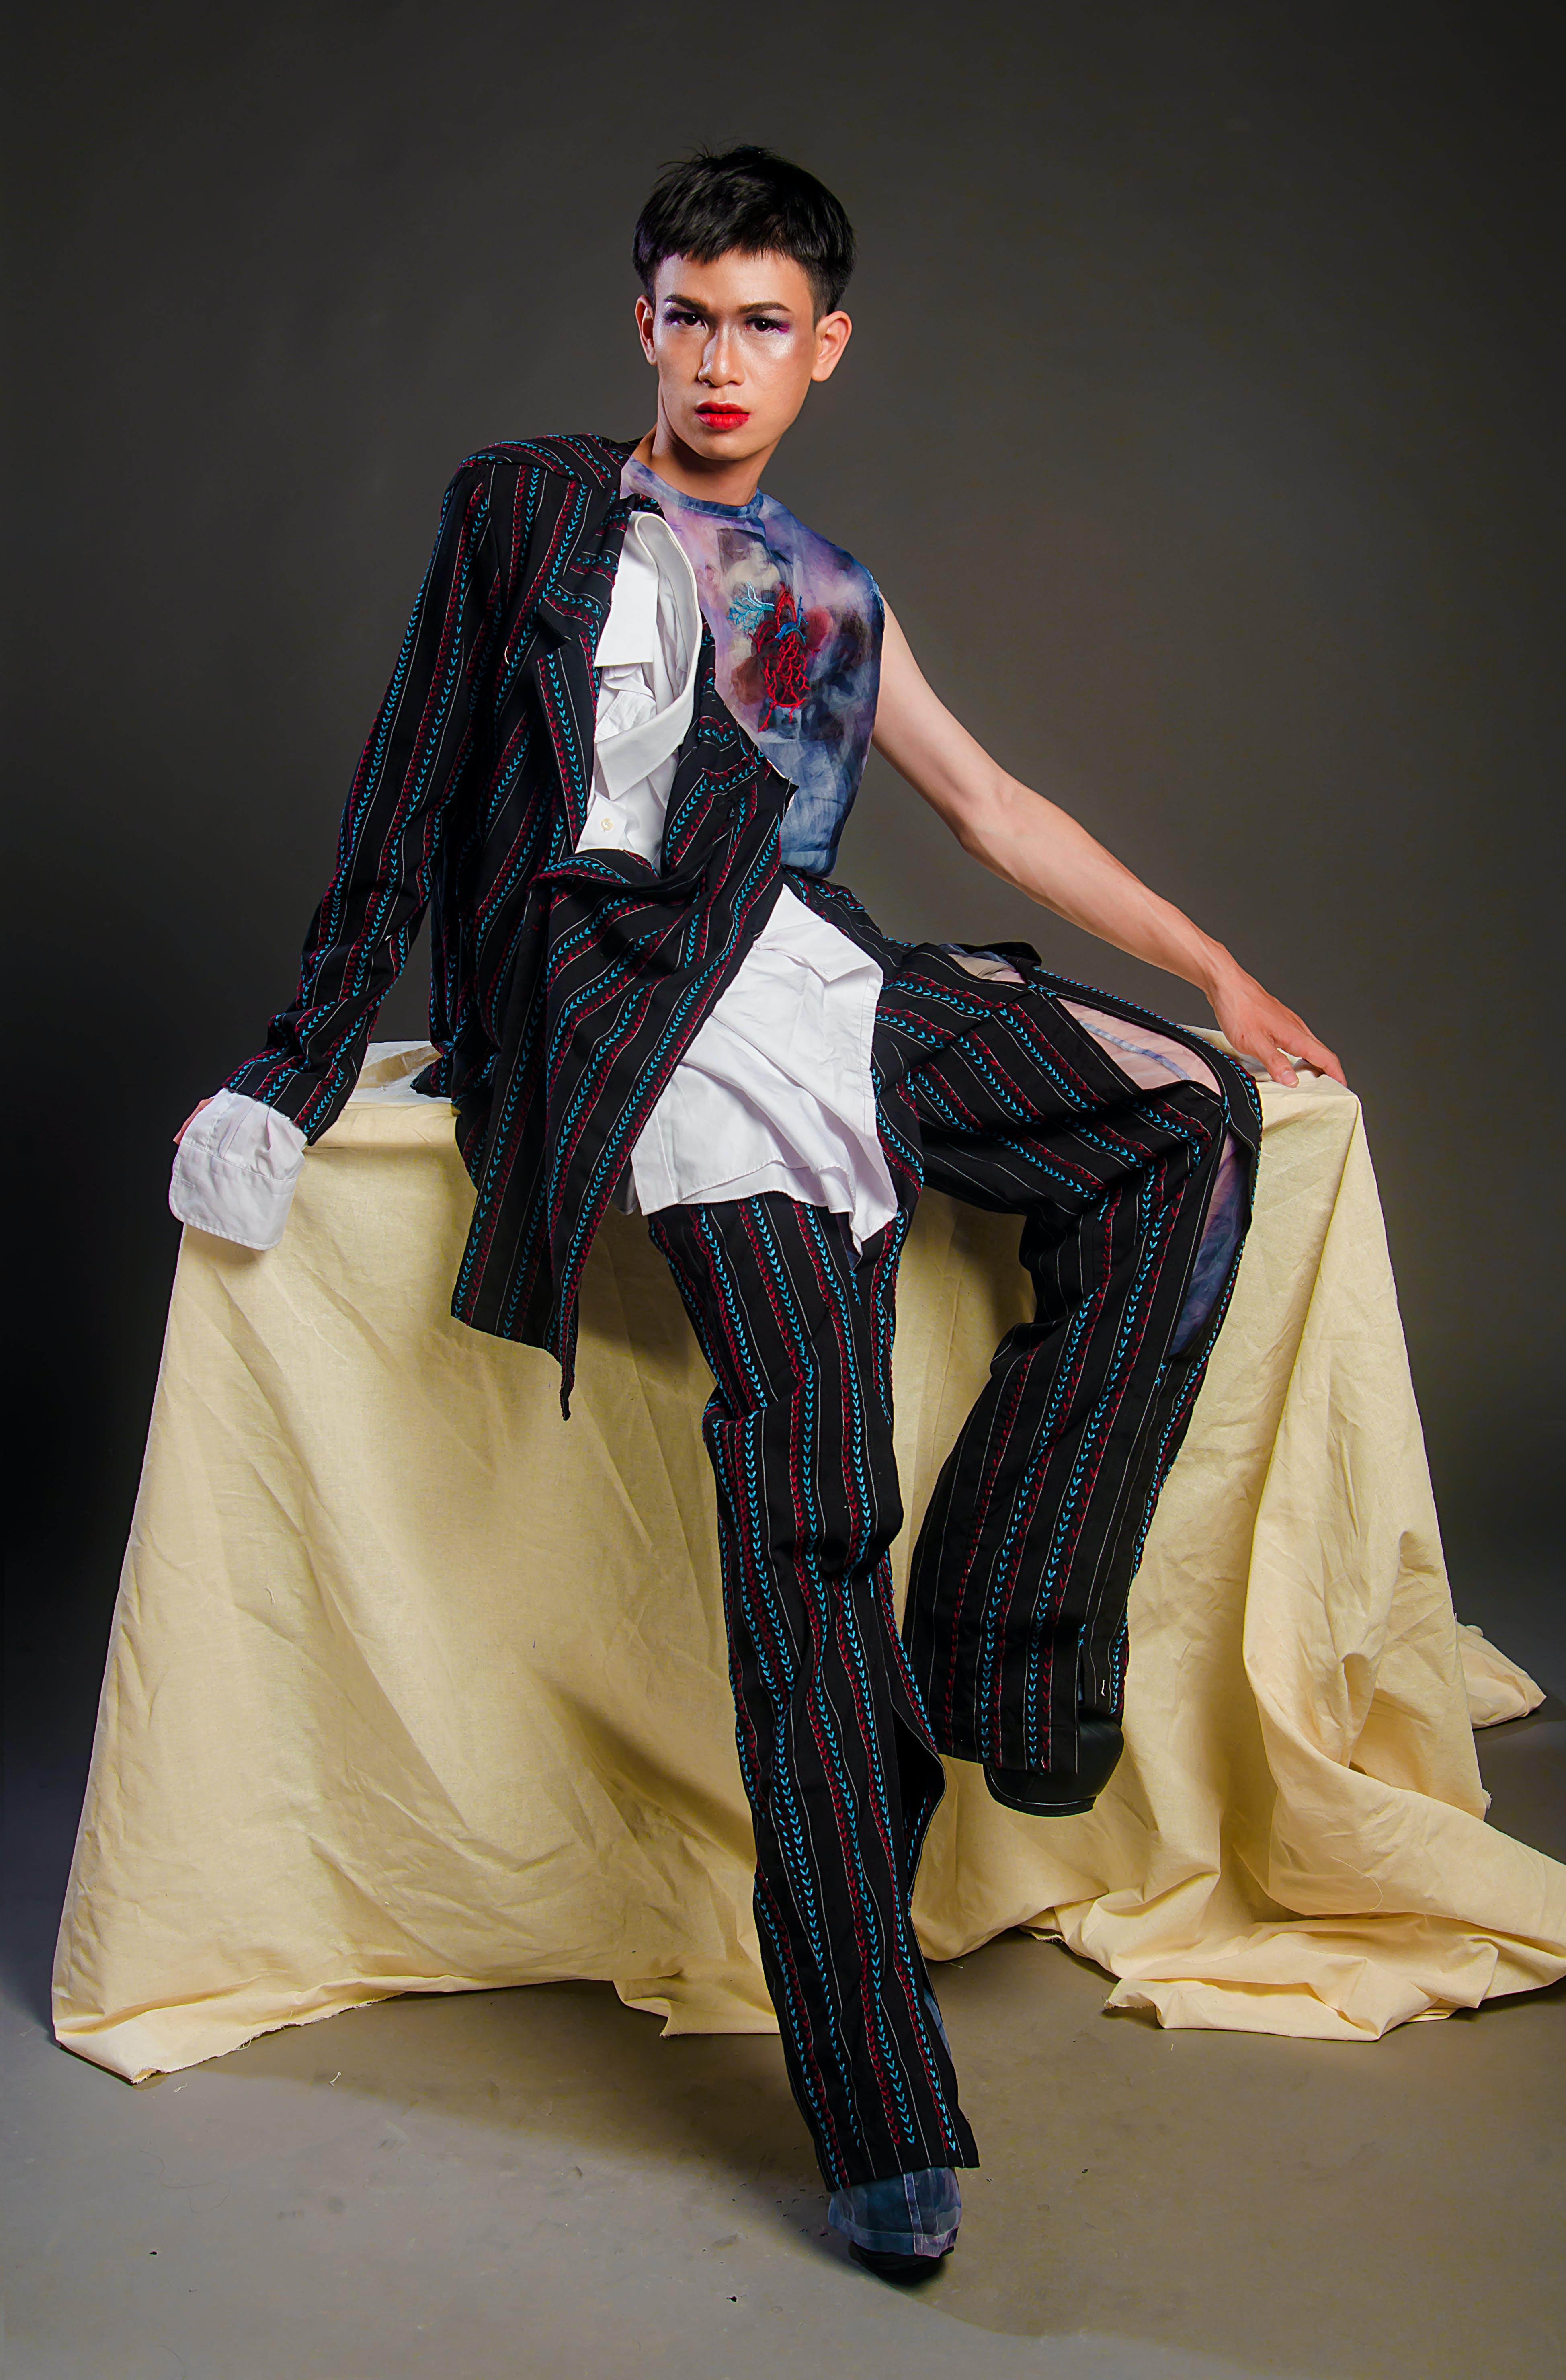 Kostenloses Stock Foto zu fashion, mann, person, model